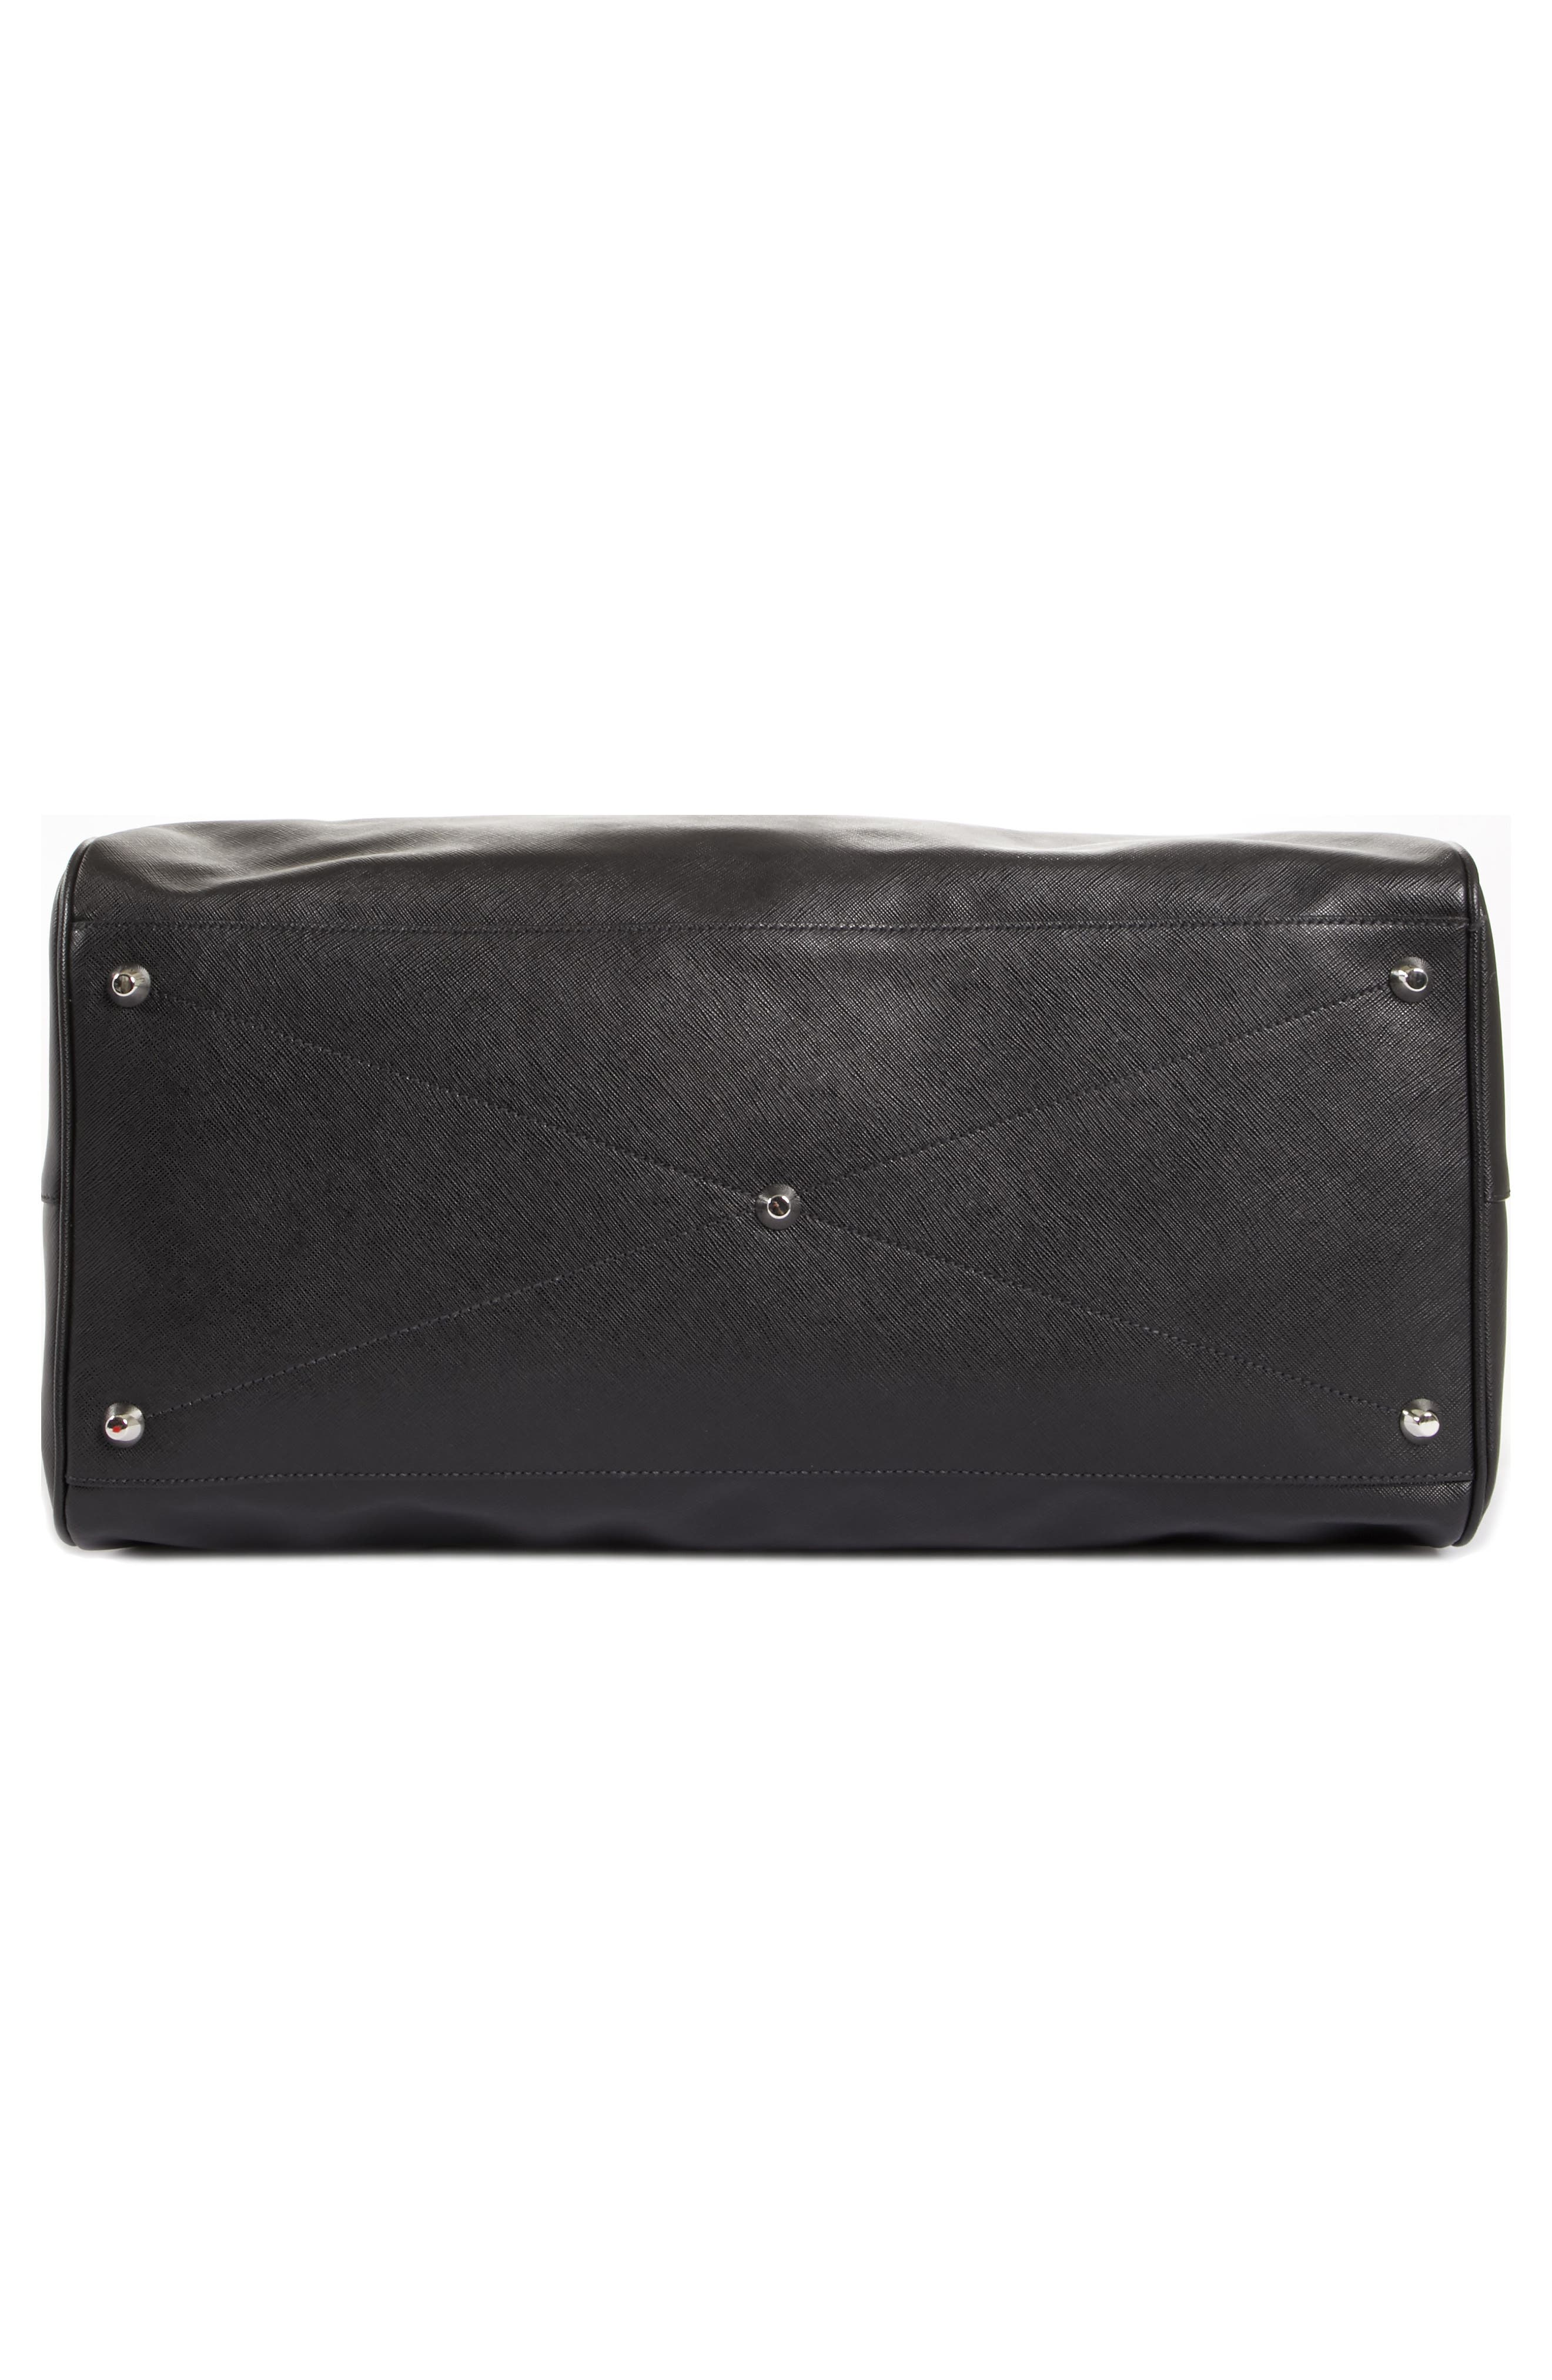 Saffiano Leather Duffel Bag,                             Alternate thumbnail 6, color,                             F0002 Nero